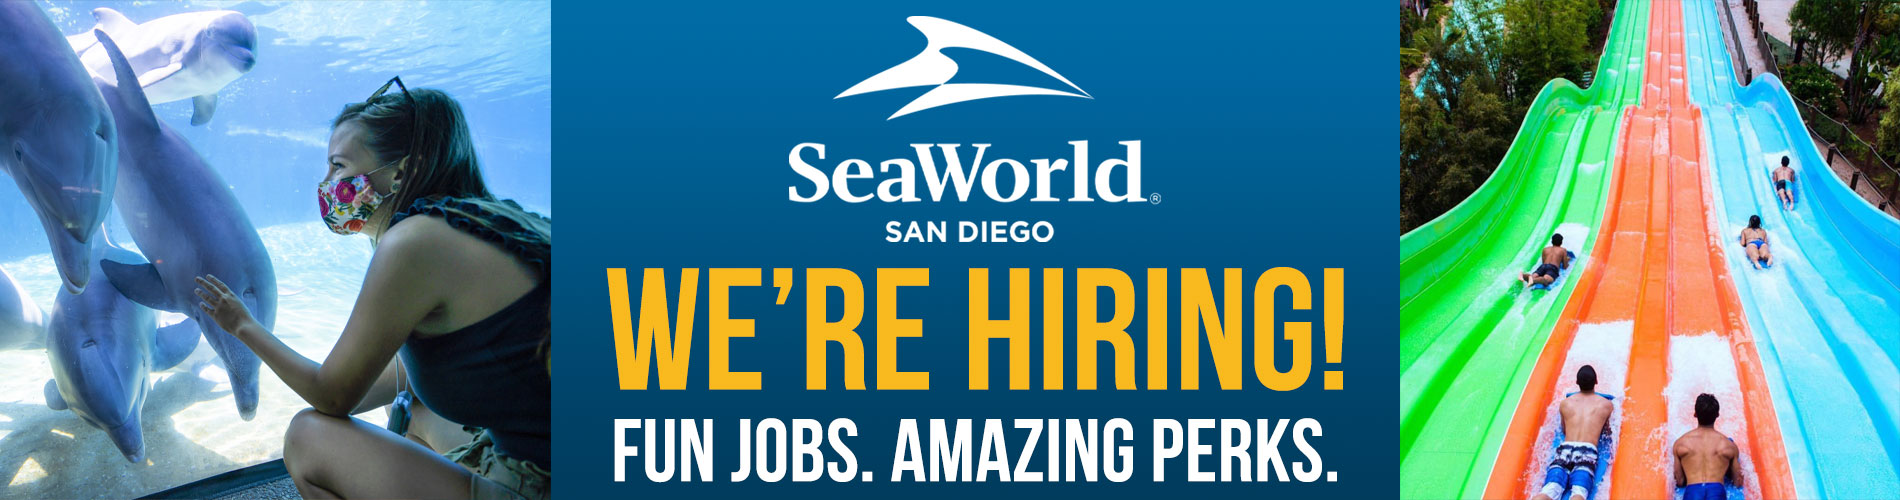 SeaWorld San Diego is hiring!